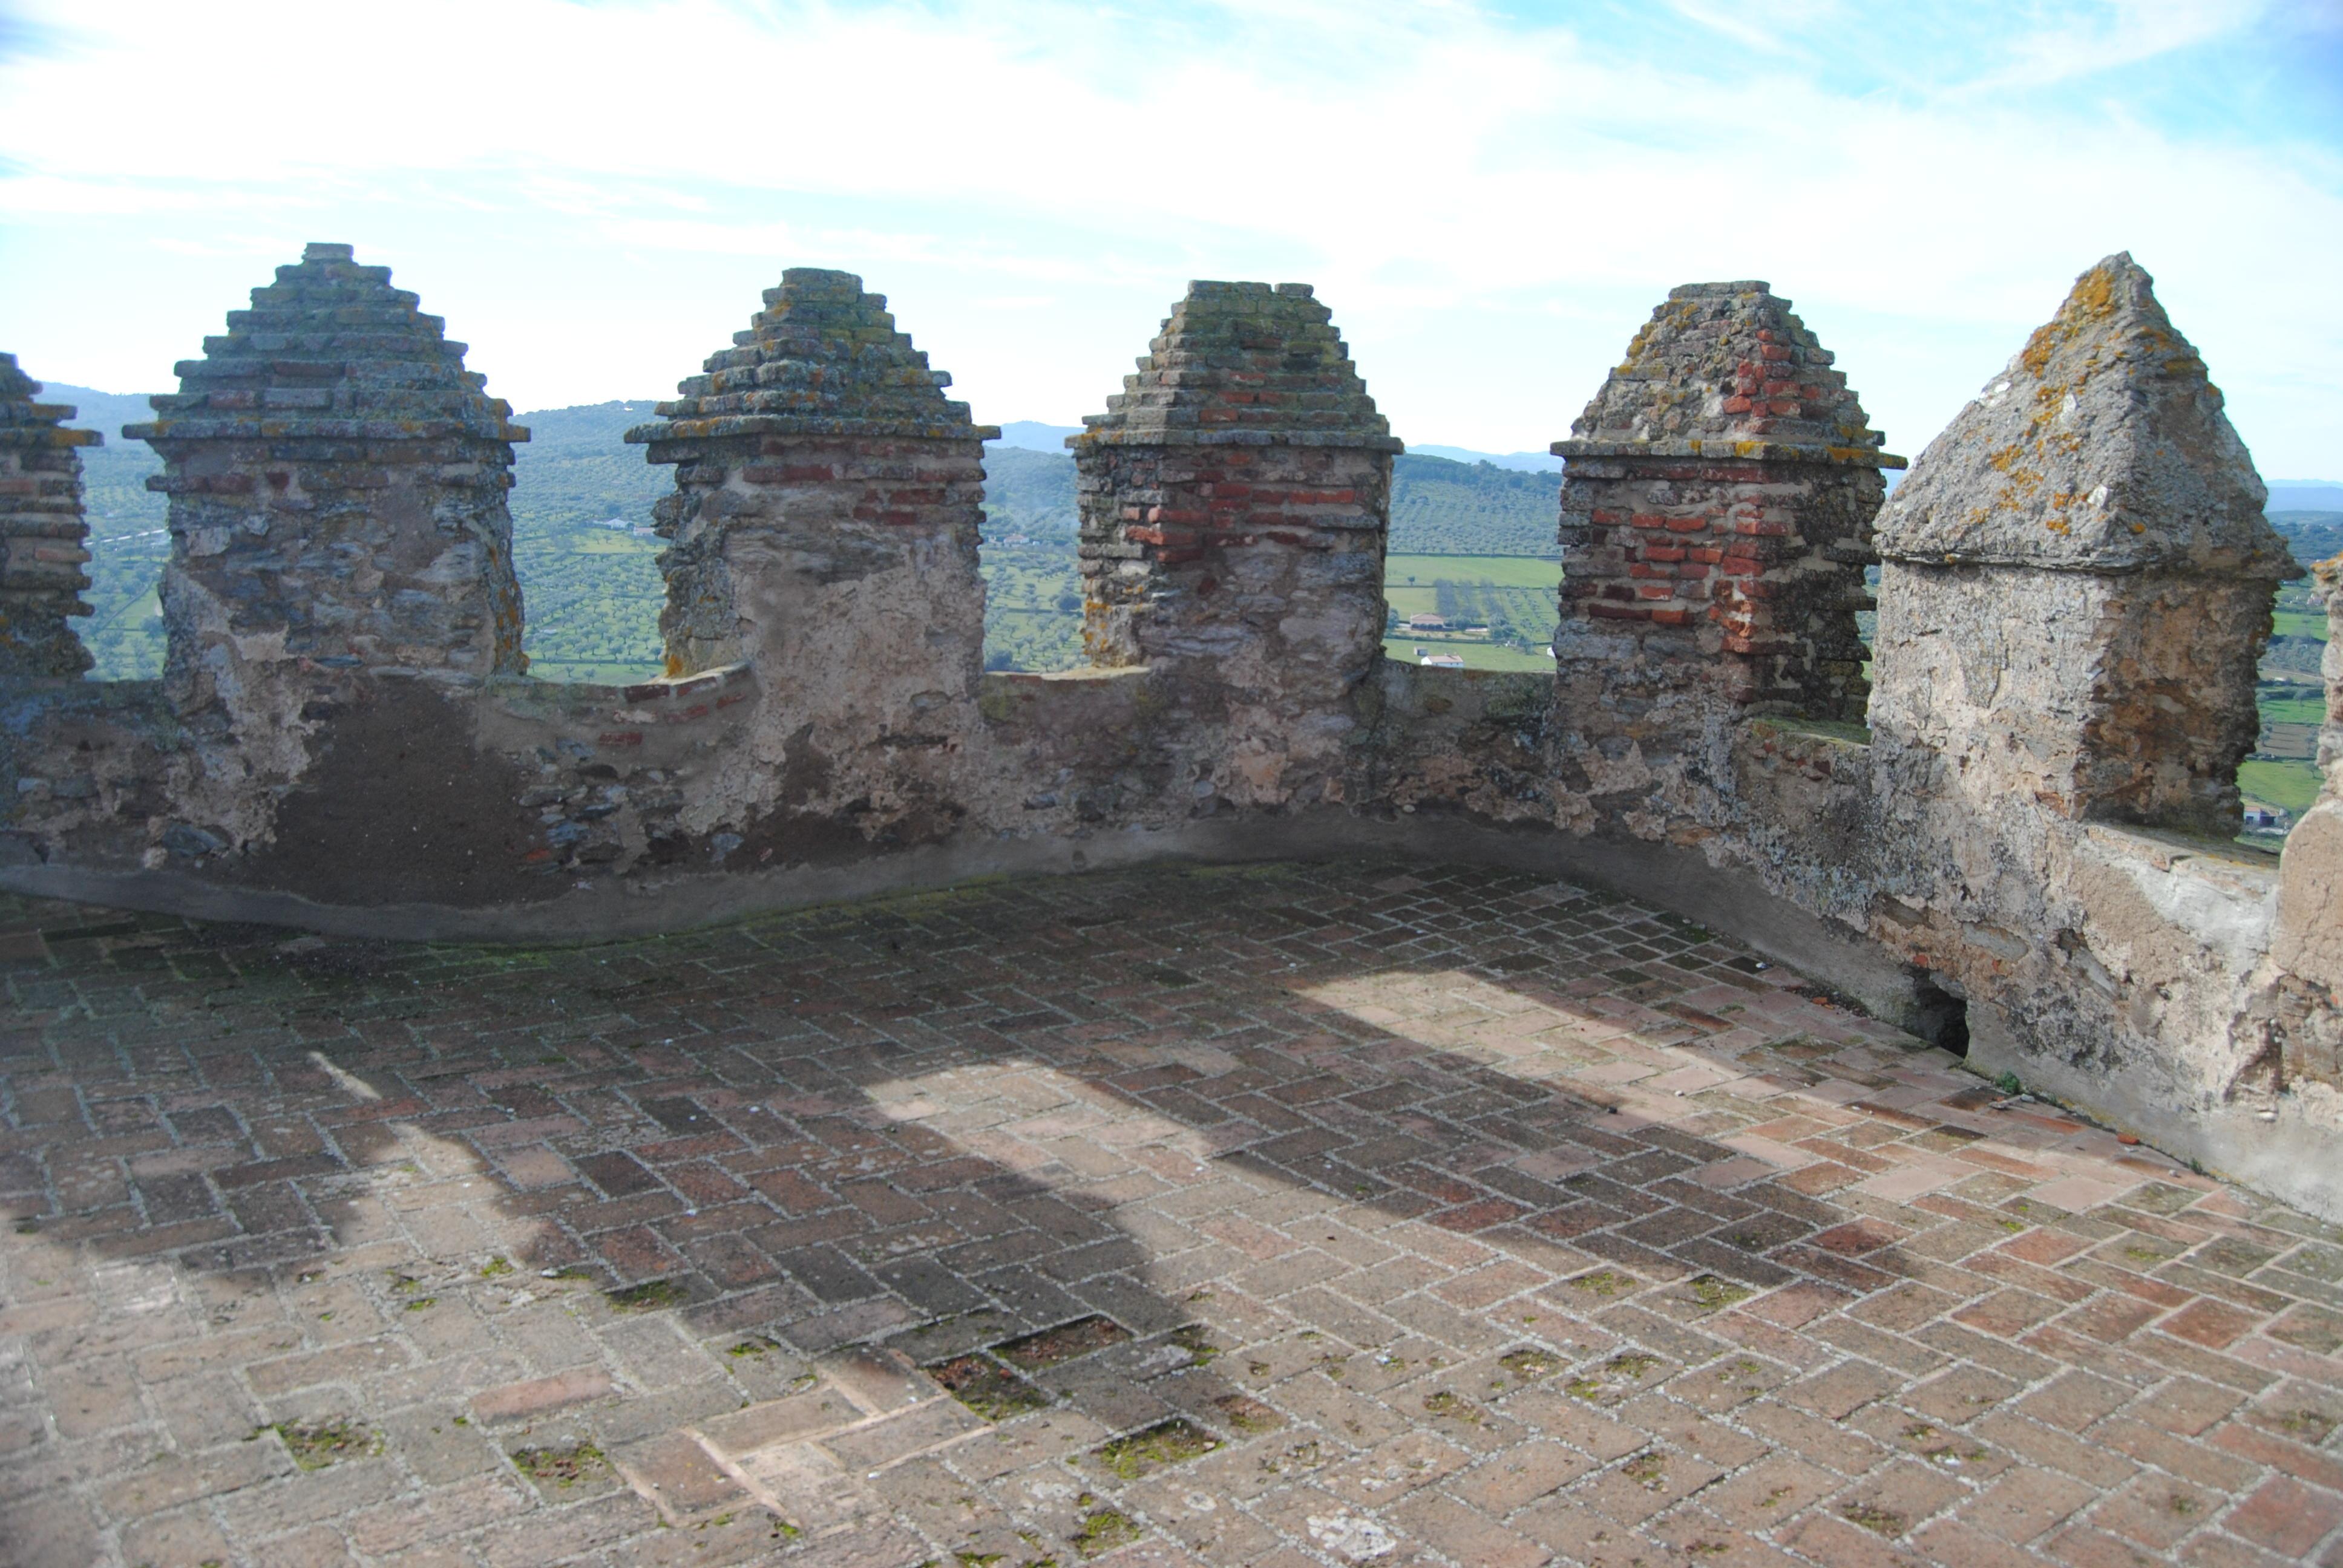 File:Castillo de Segura de León (15459258624).jpg - Wikimedia Commons